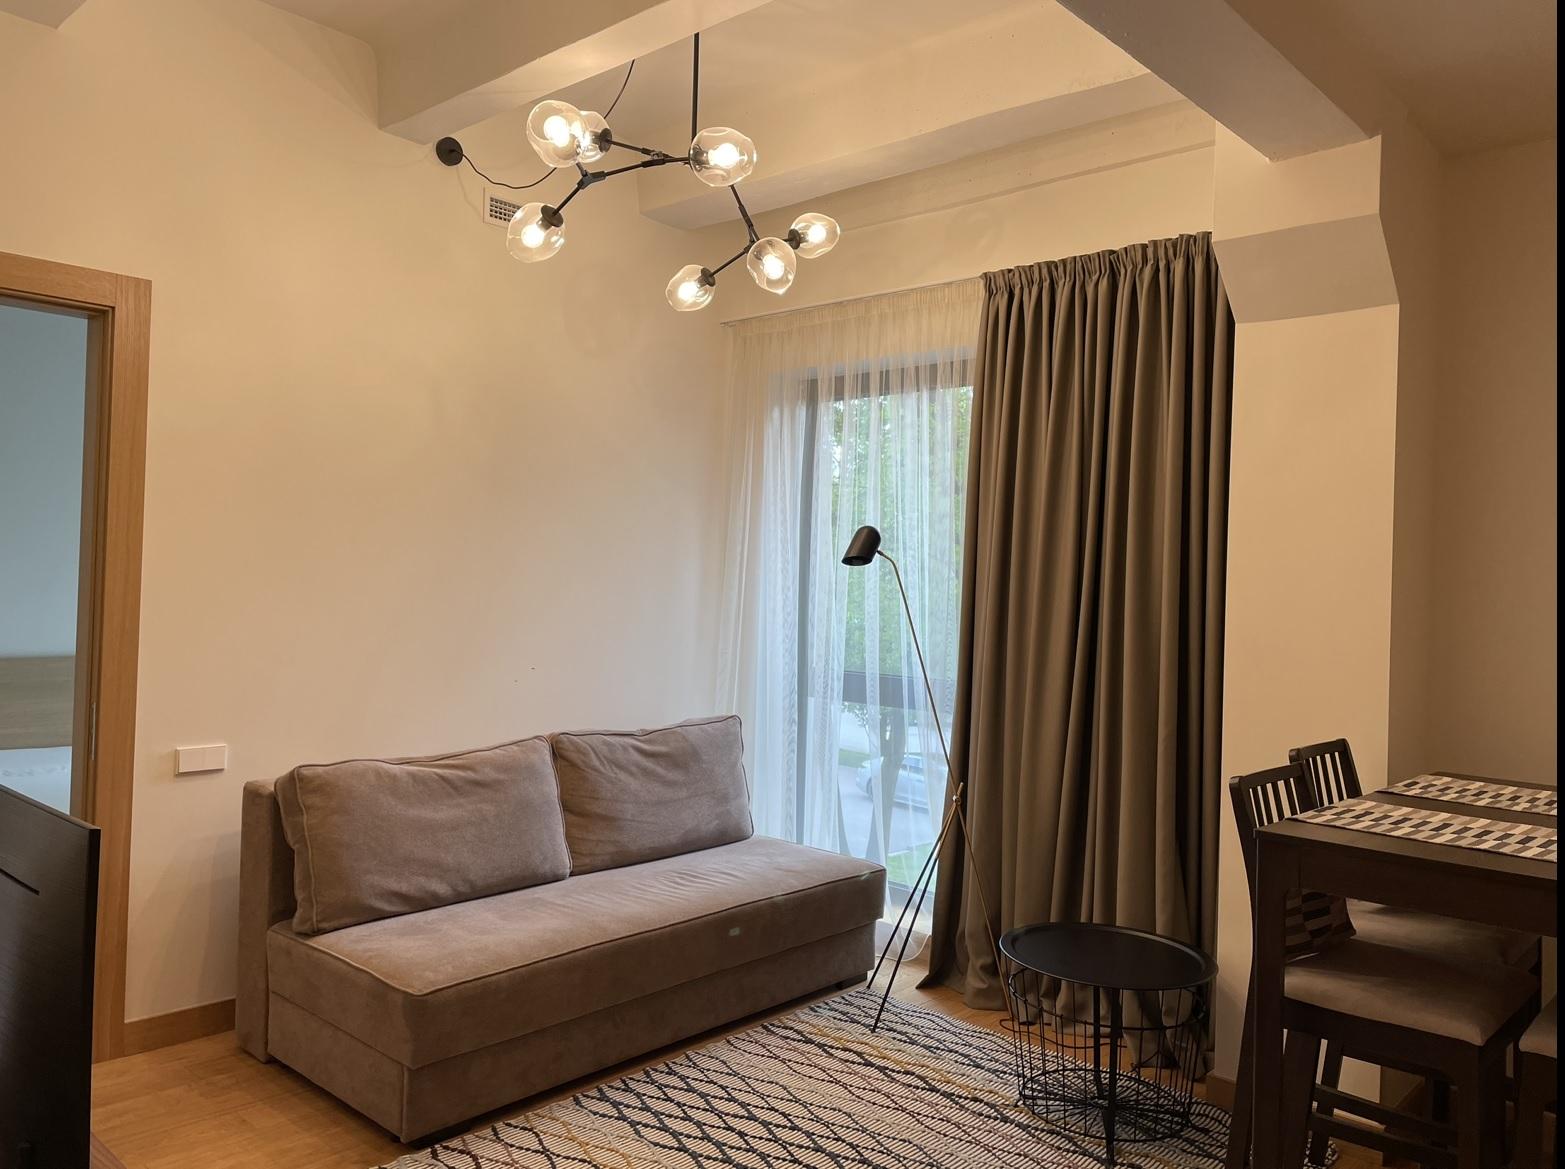 Apartment for rent, Mūkusalas street 25 - Image 1